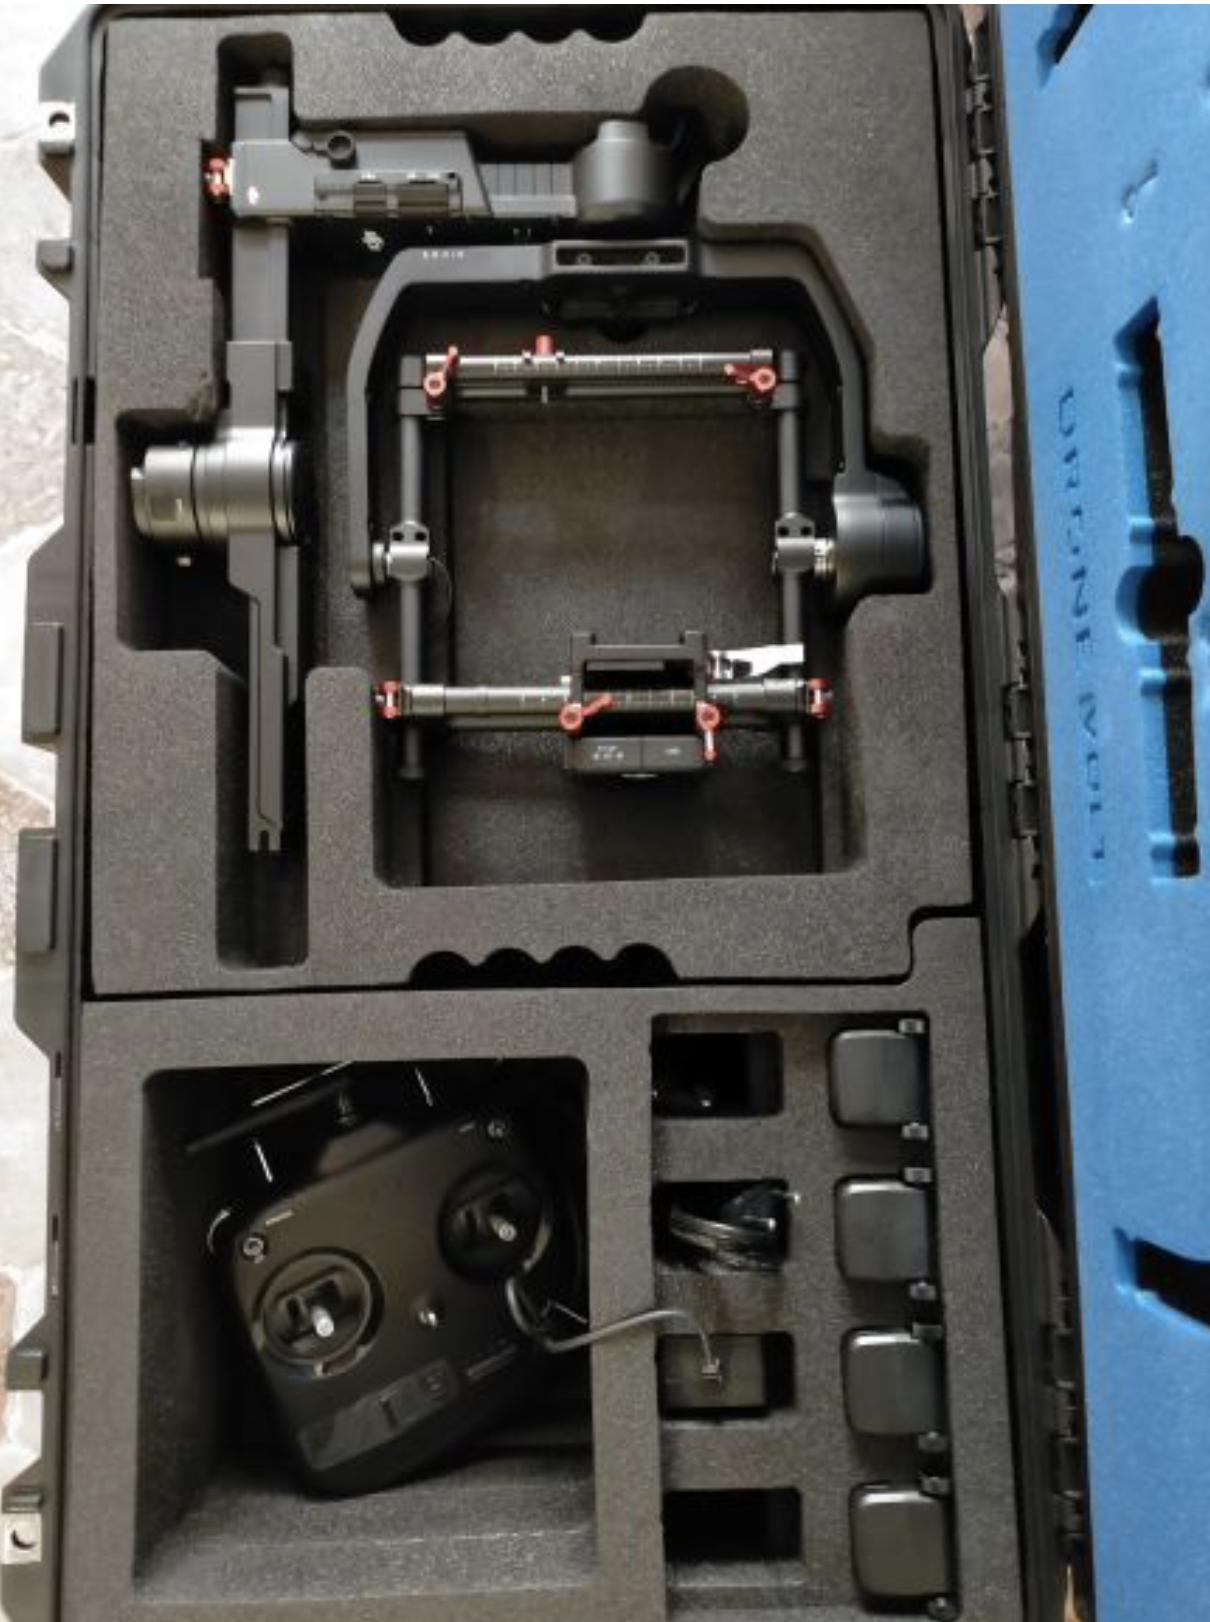 NEUF: Drone dji m600 pro + stabilisateur image ronin + flying case + batteries en supplement